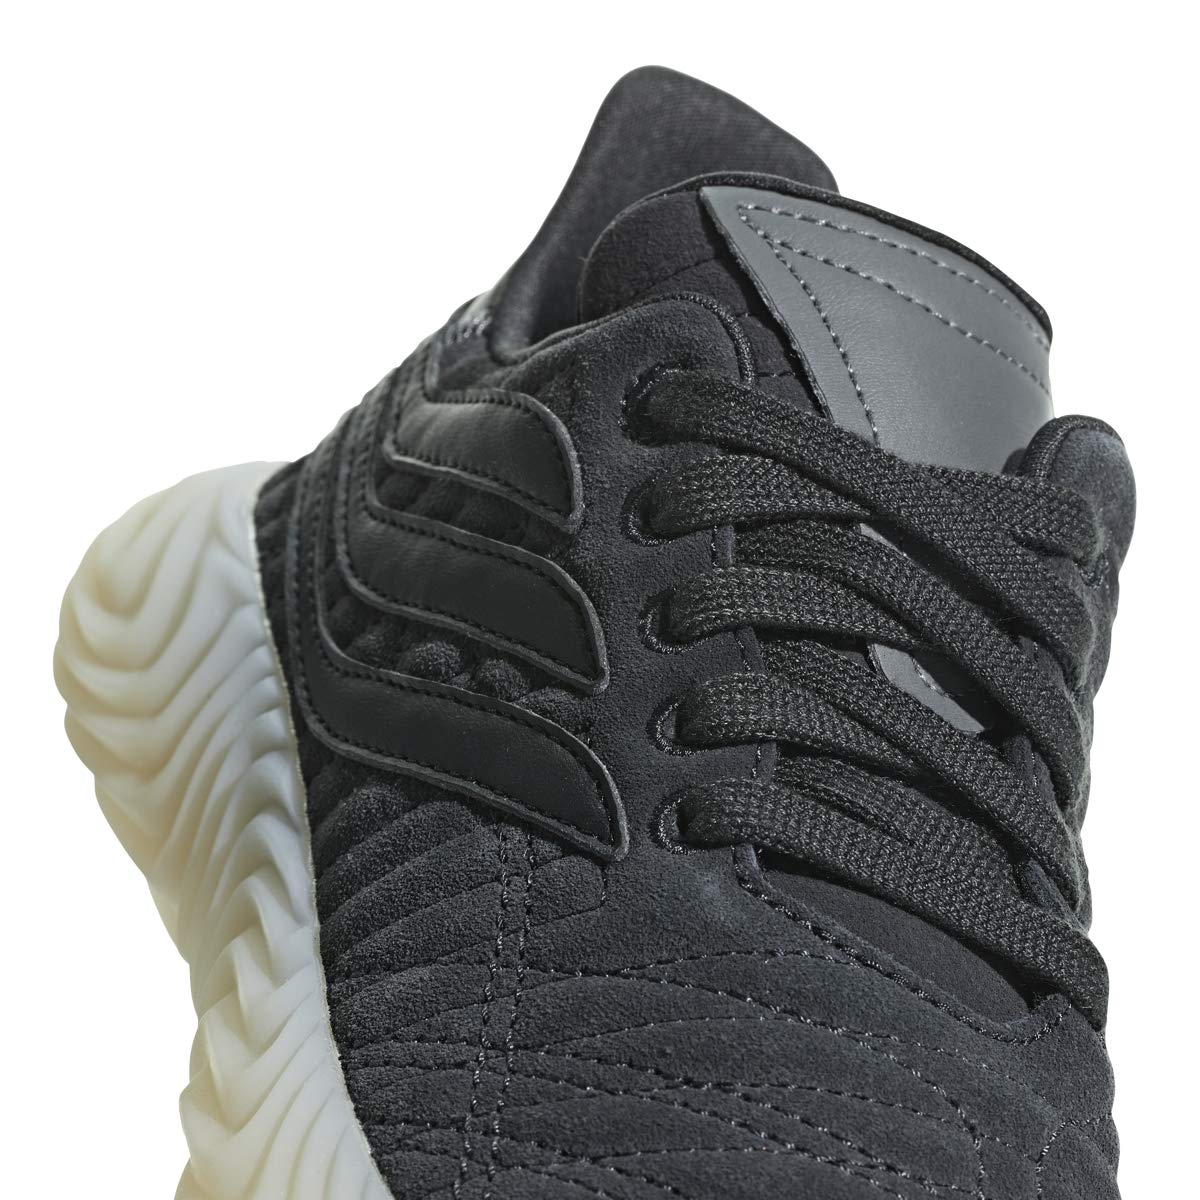 the best attitude 2d84d 79670 Amazon.com  adidas Boys Big Kids Originals Sobakov Casual Shoes Big Kids  Cg6770  Sneakers